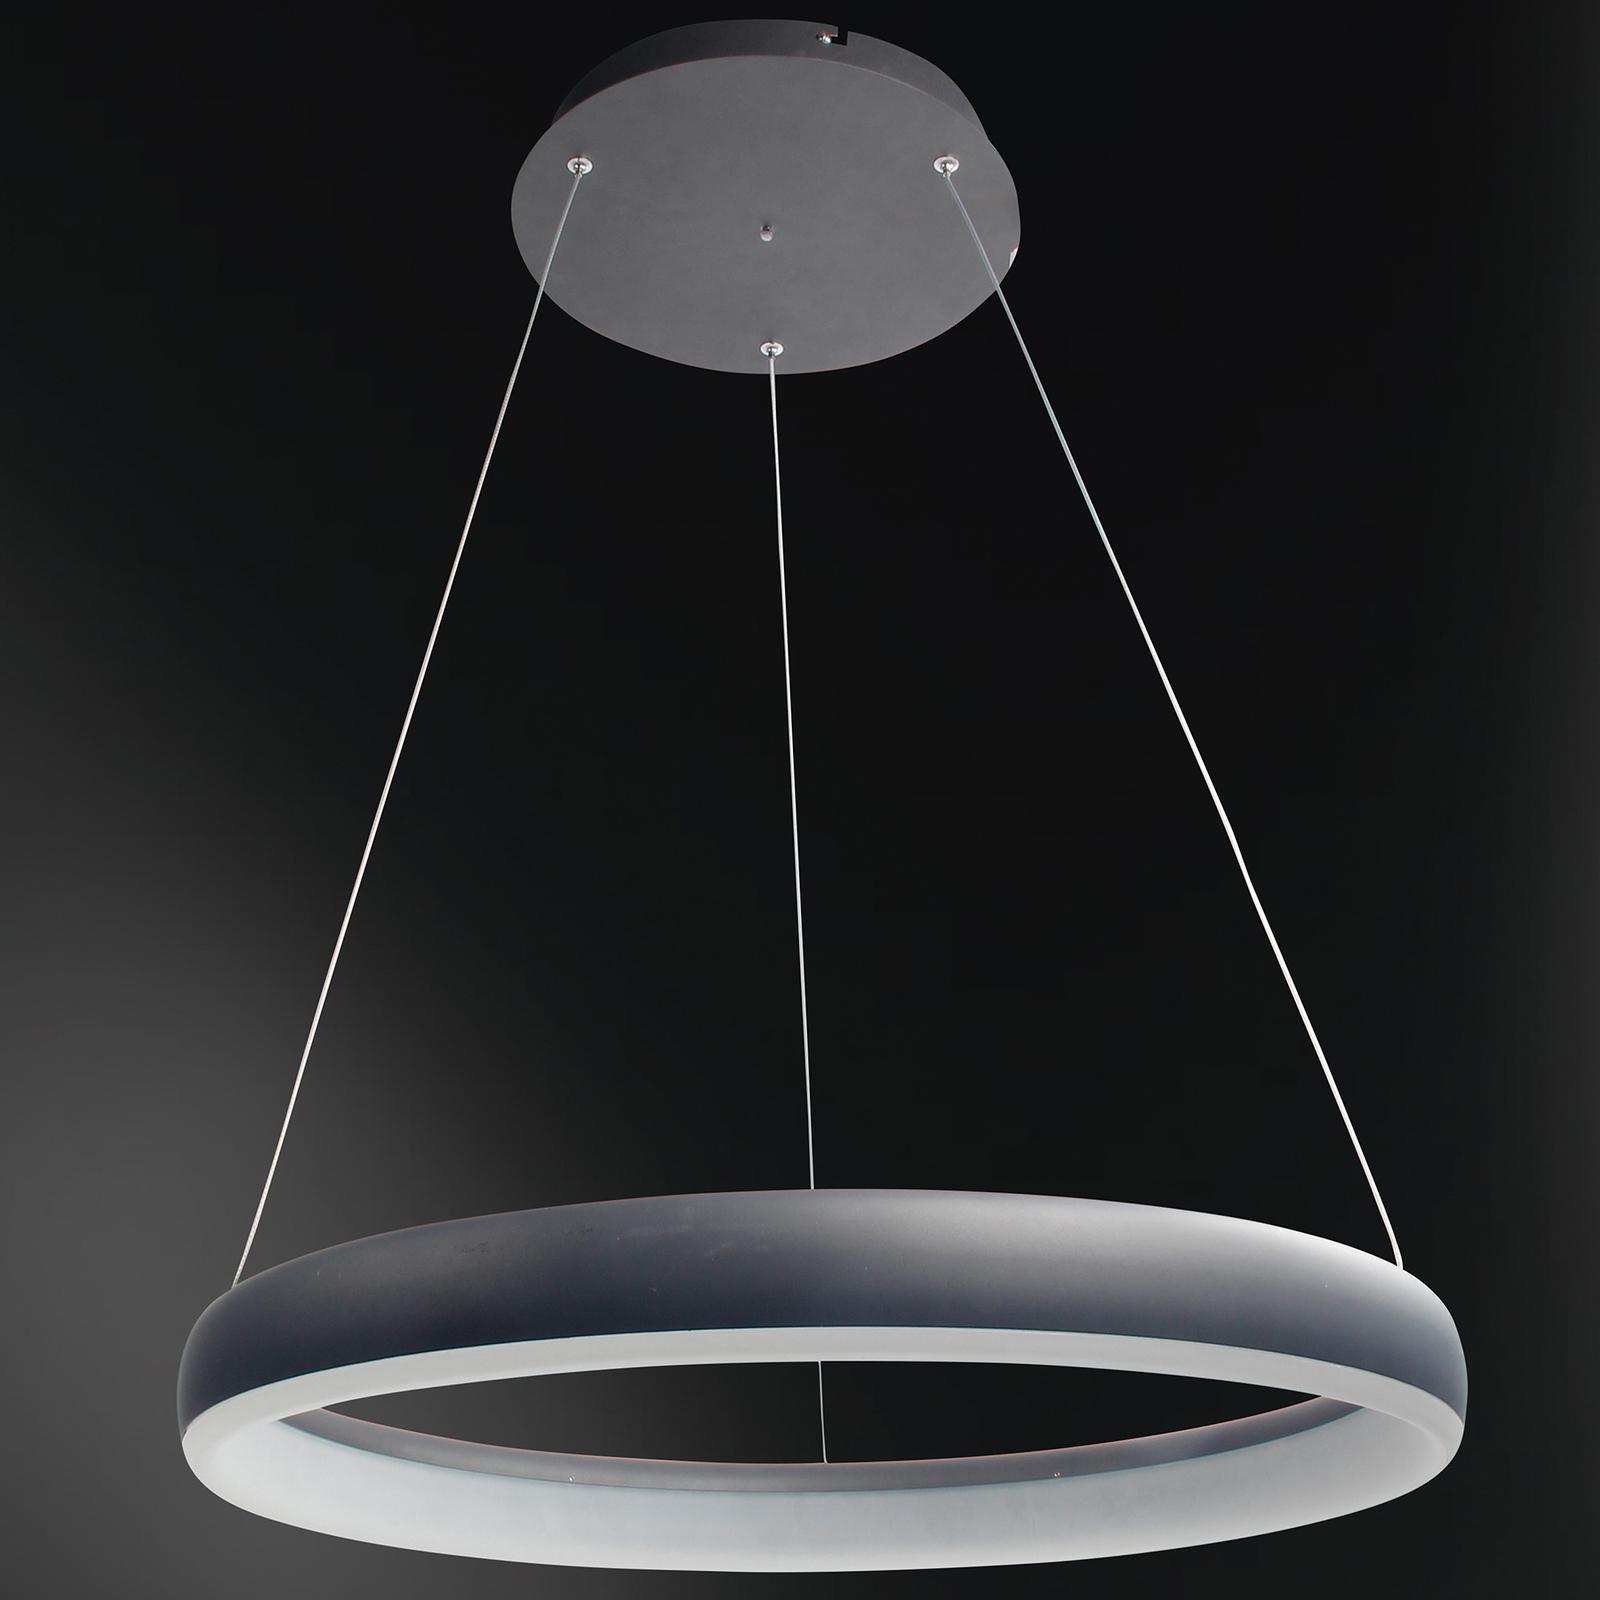 WiZ Clint LED-riippuvalaisin musta, Ø 60 cm